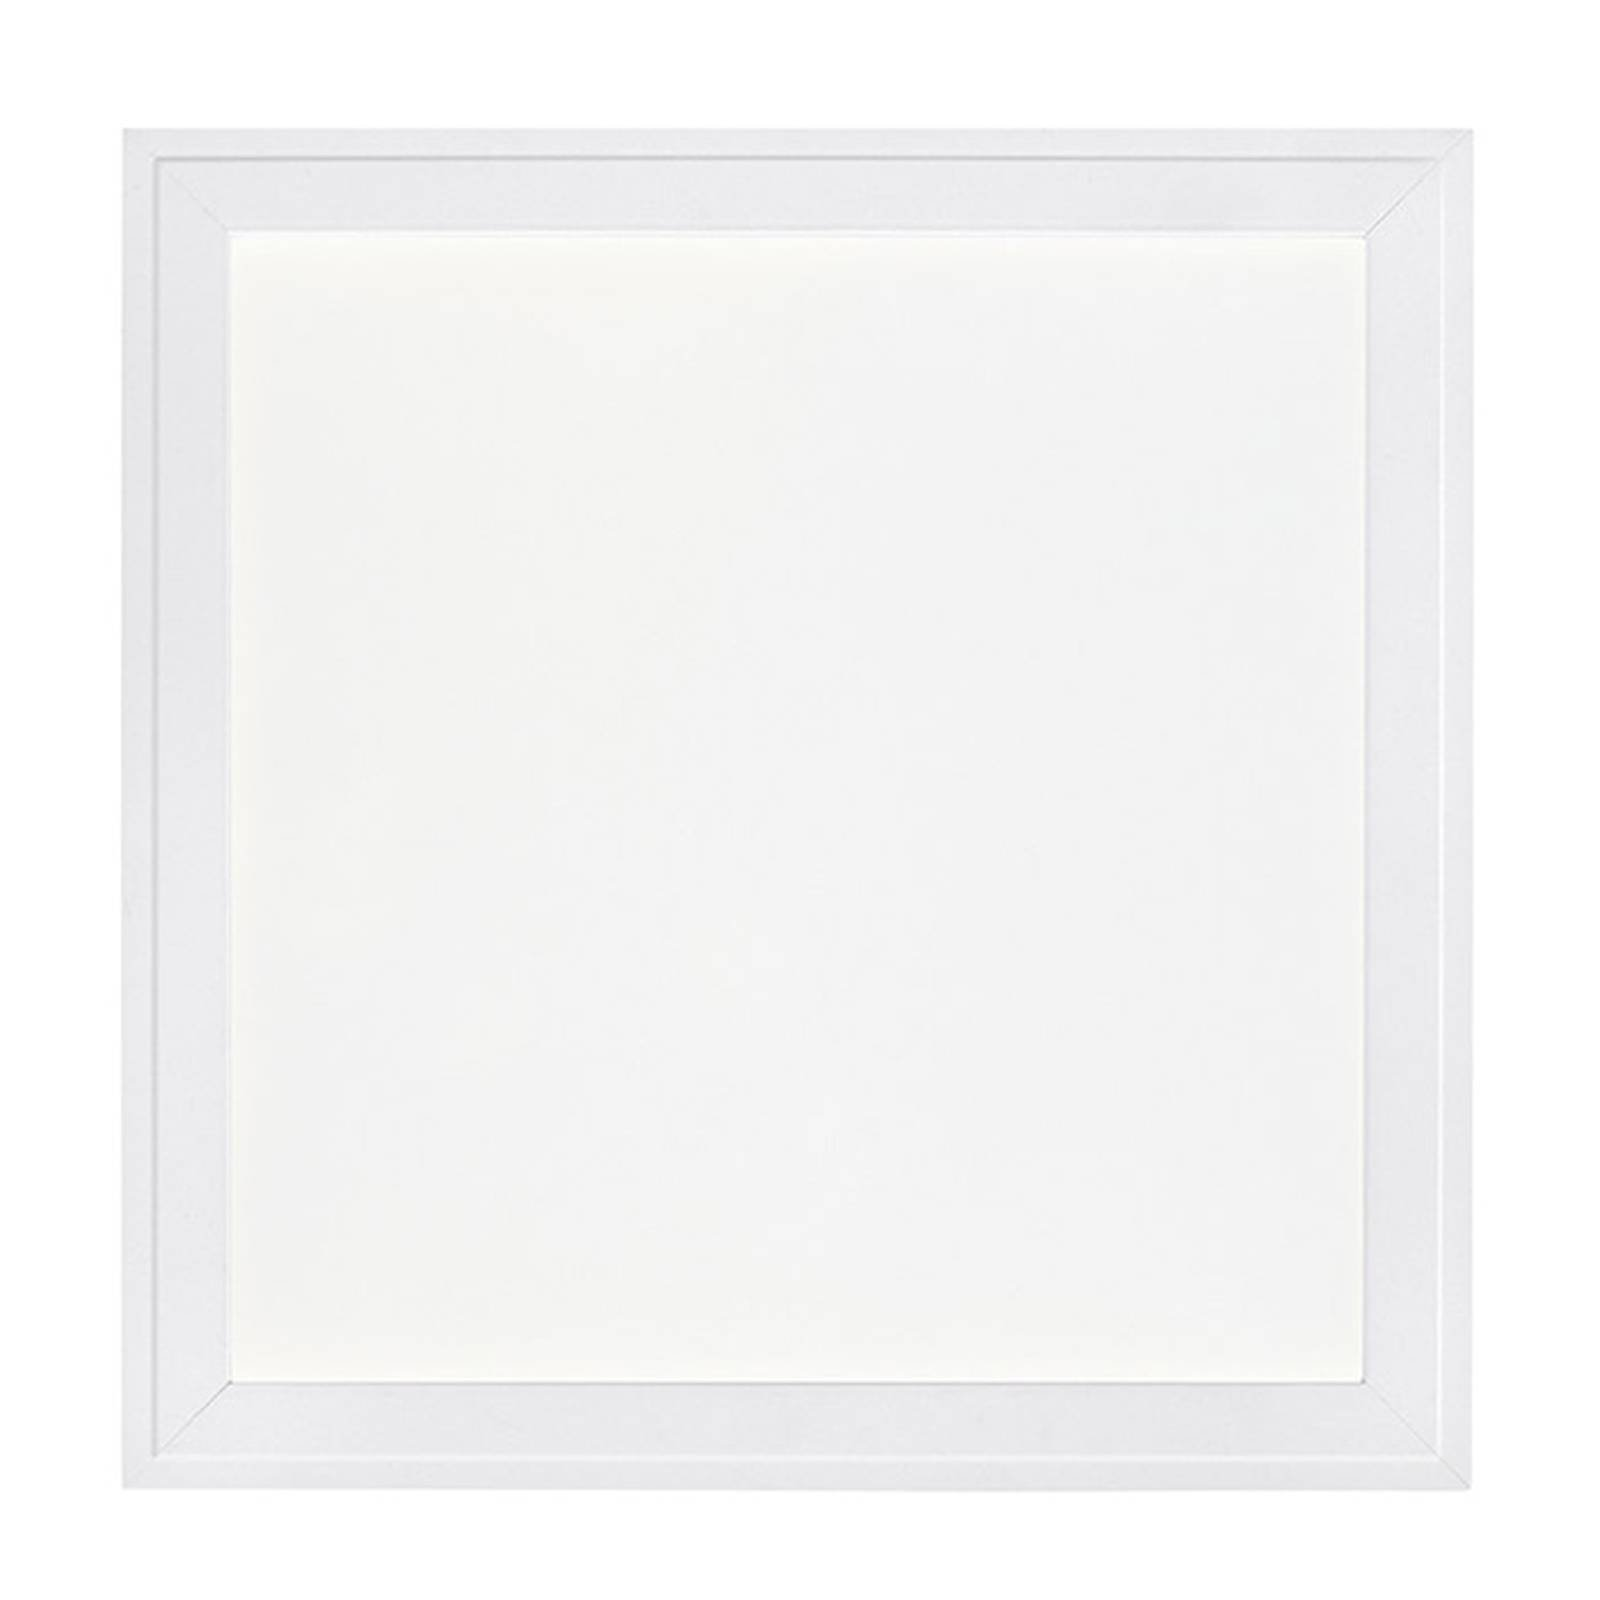 LED-taklampe 3031-016 Piatto med fjernkontroll